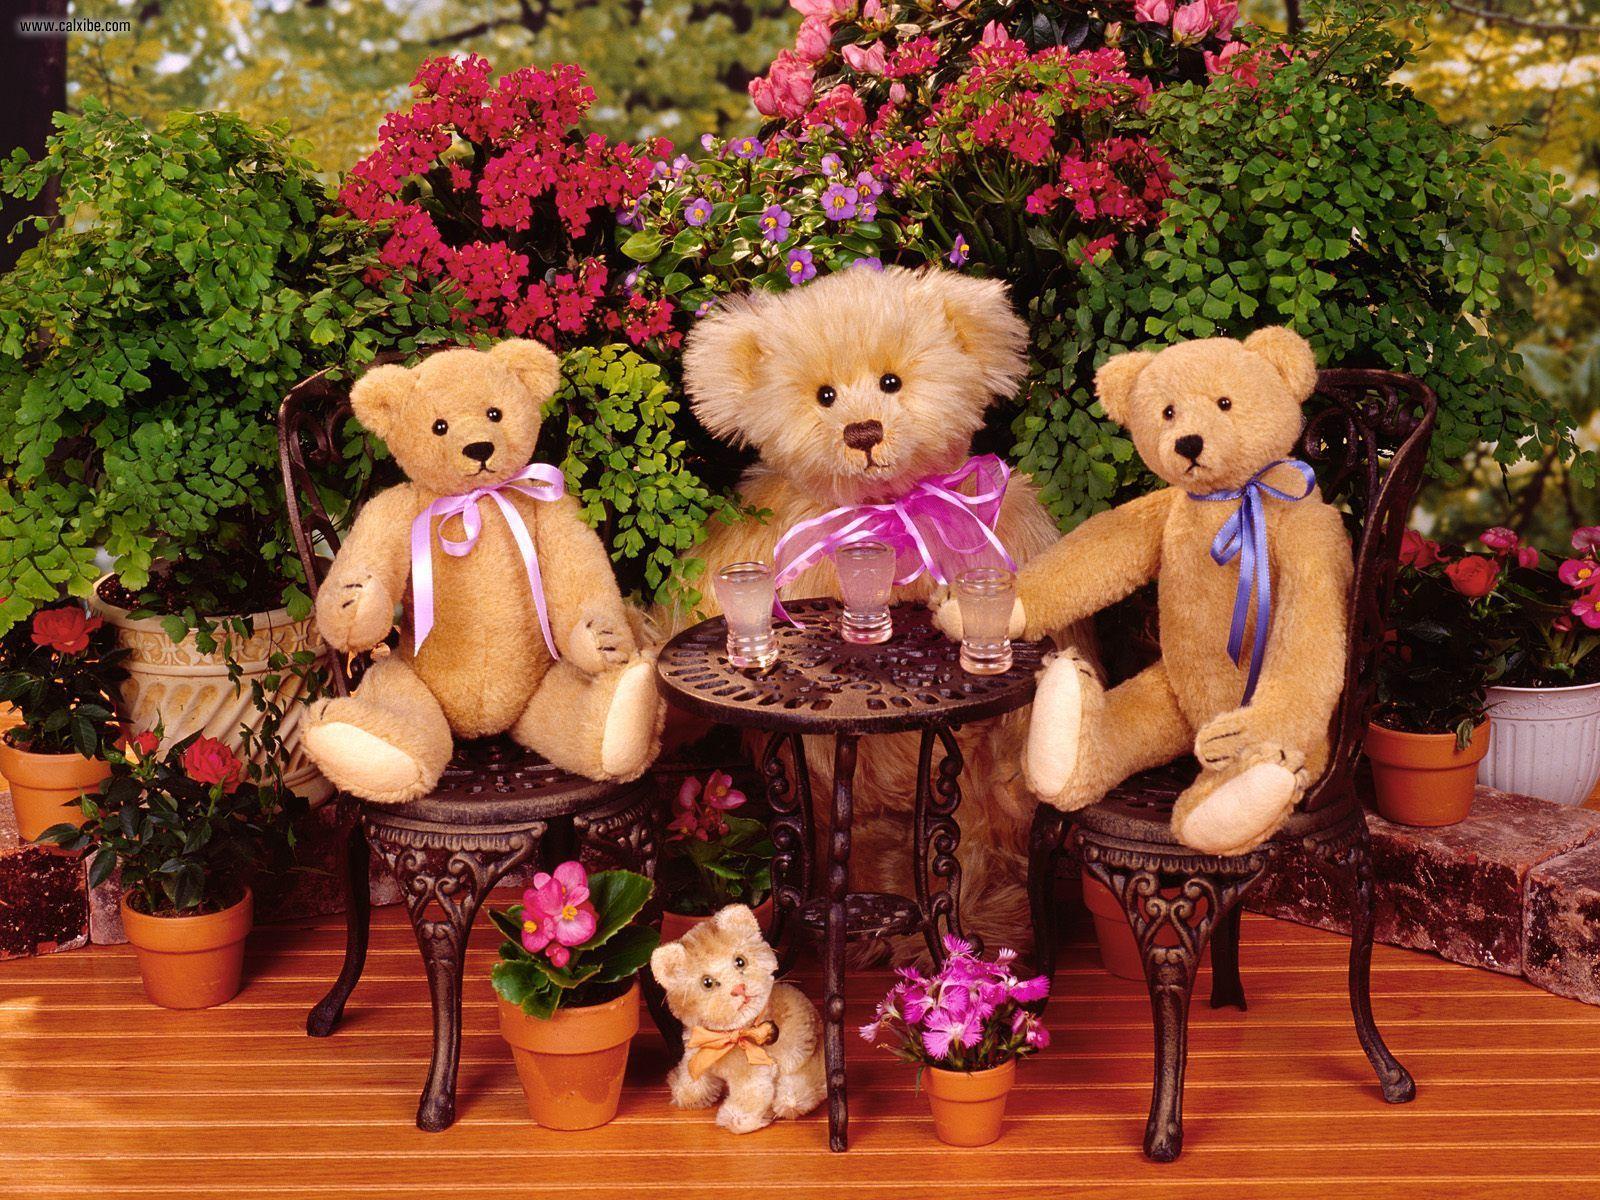 Teddy Bear Flowers Family Wallpaper